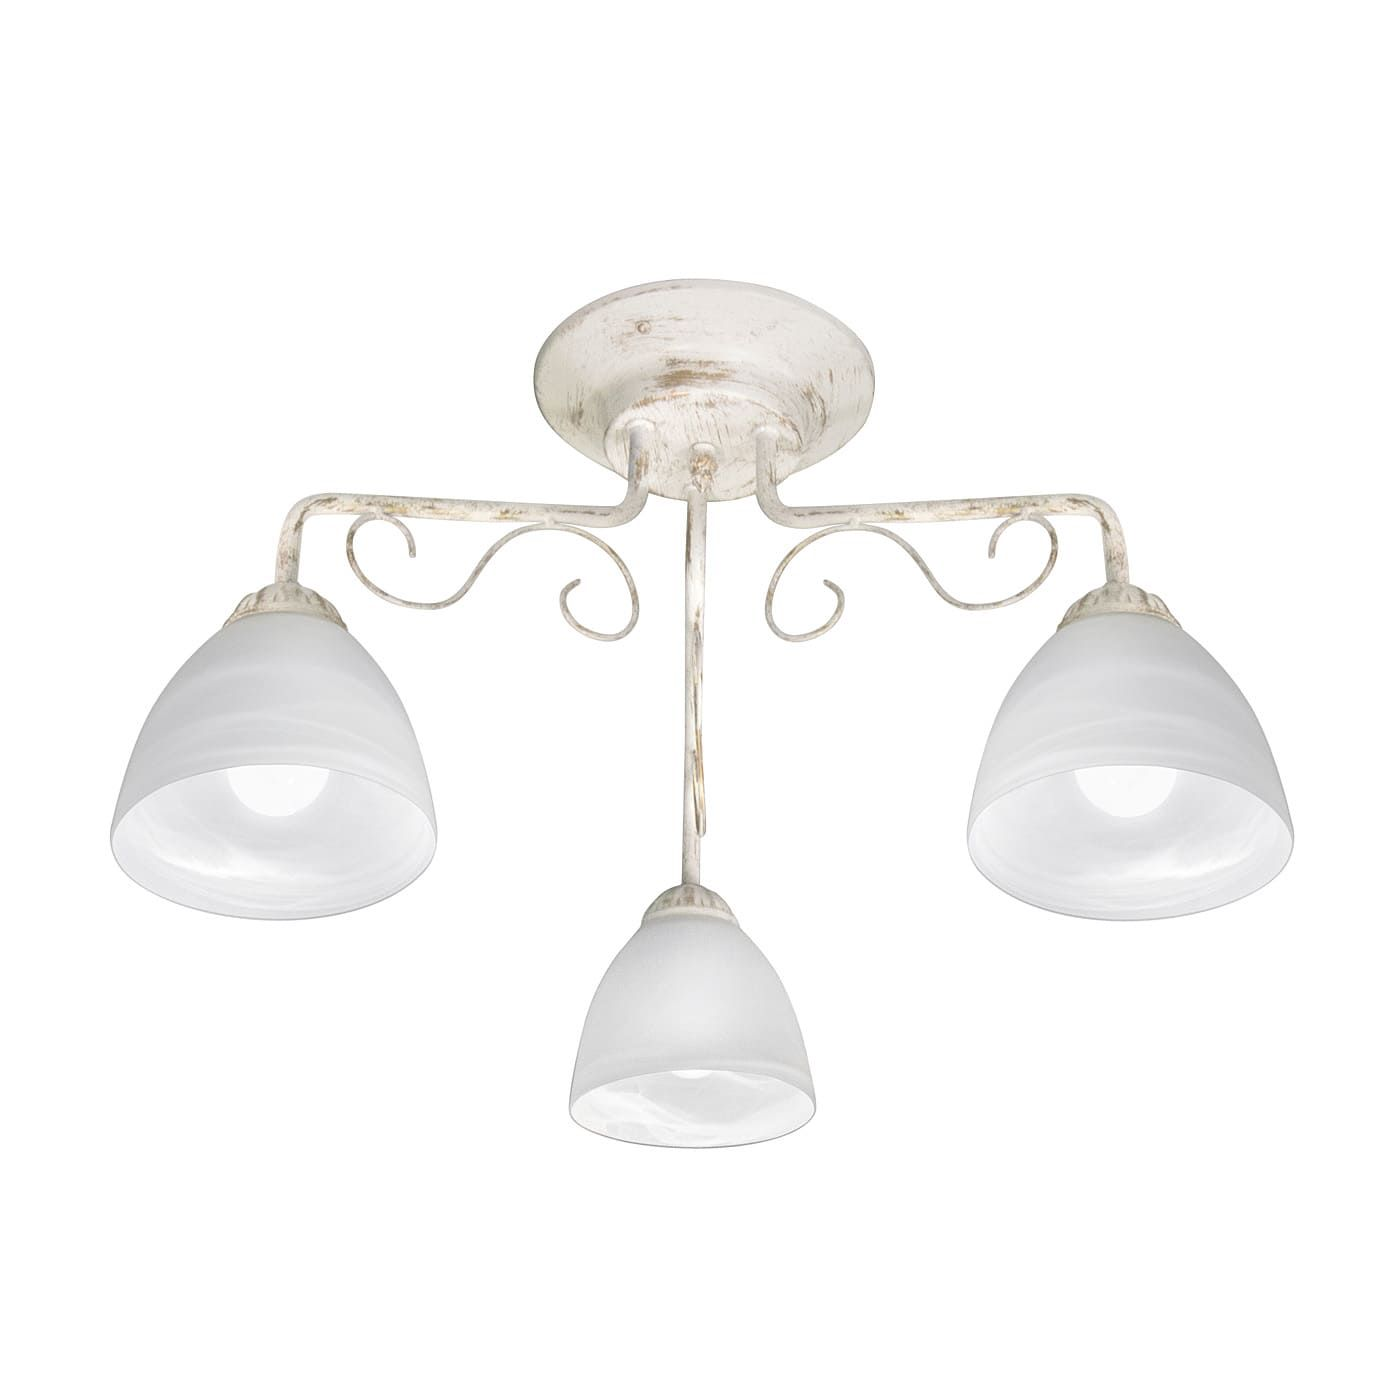 PETRASVET / Ceiling chandelier S2204-3, 3xE27 max. 60W